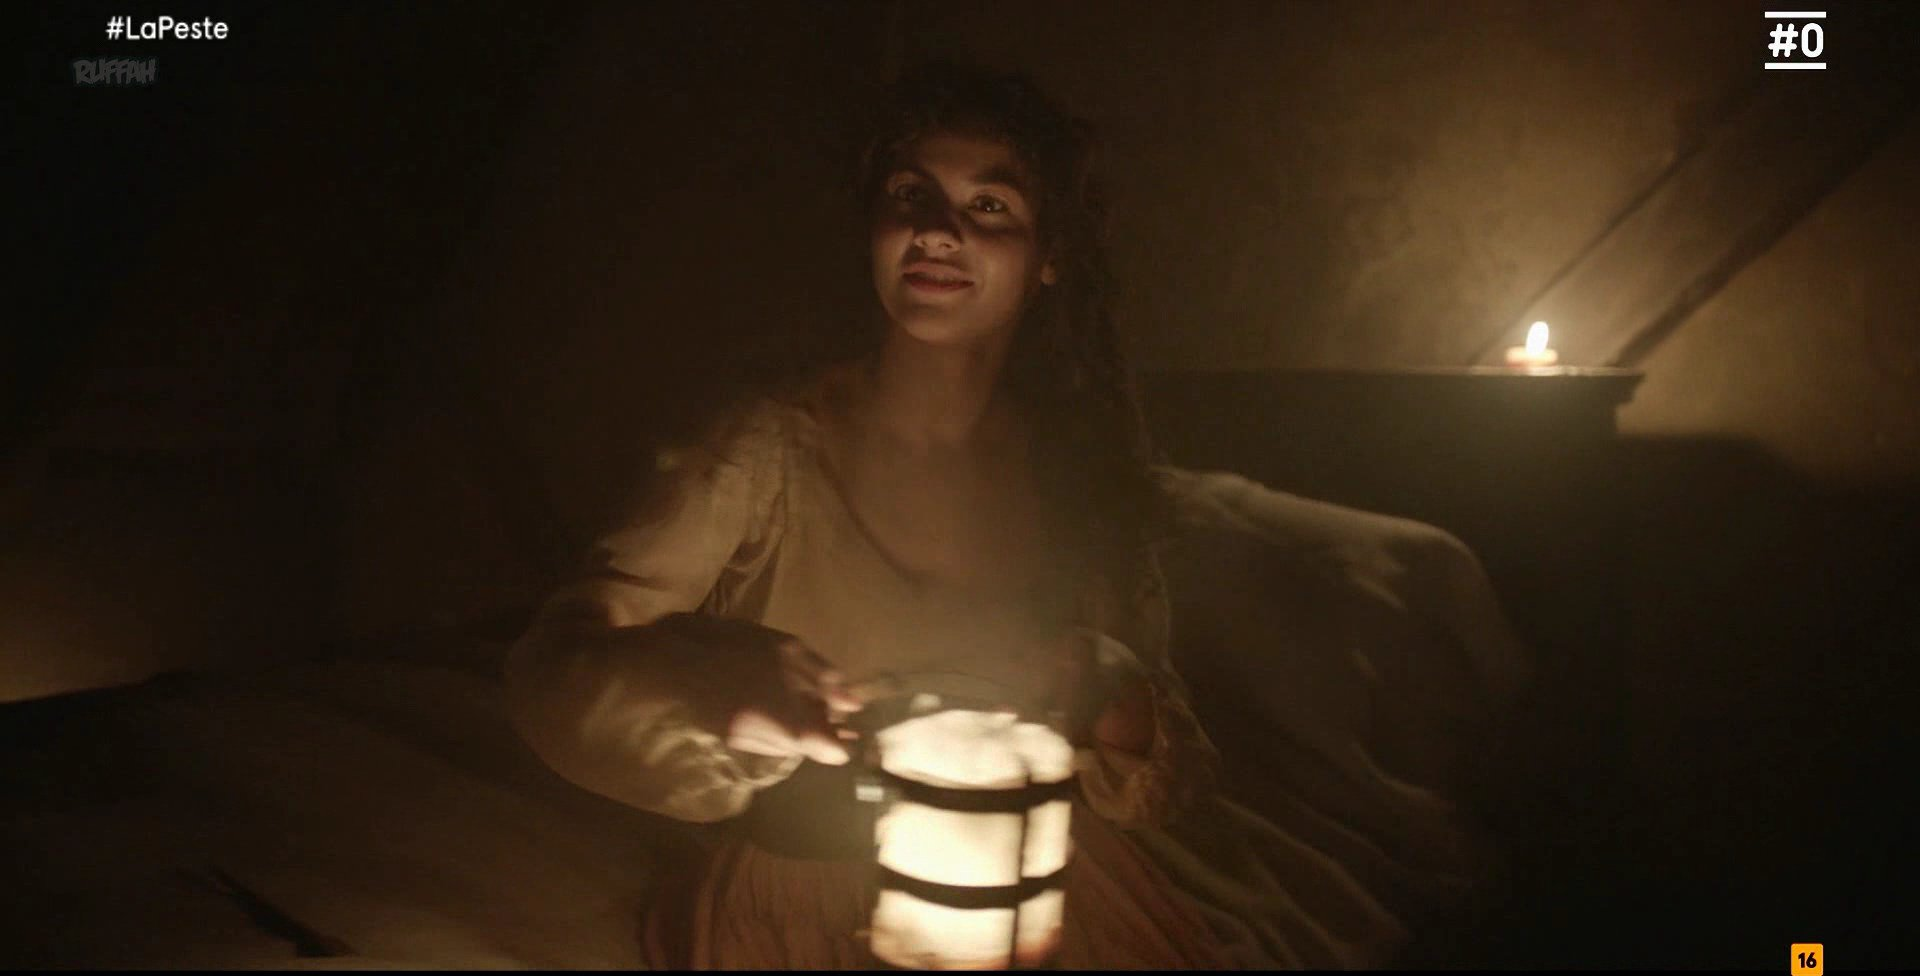 Aroa Rodriguez nude - La Peste s01e01 (2018)